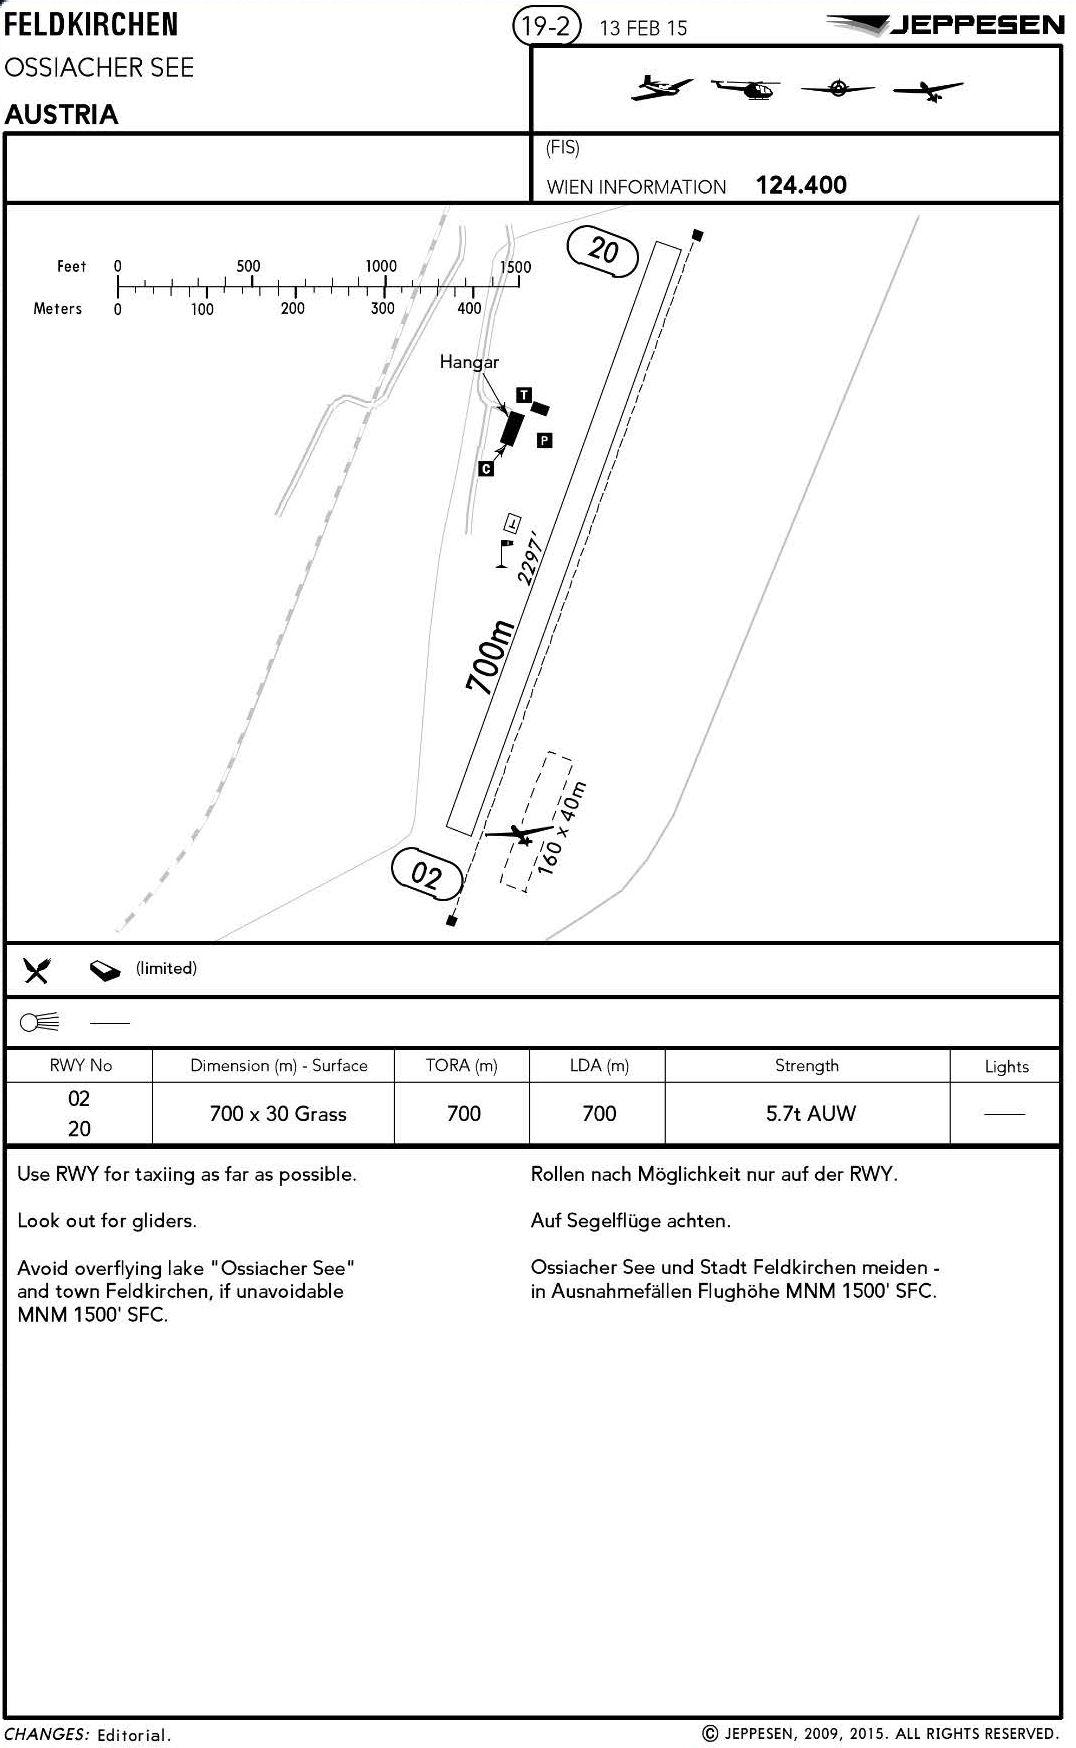 LOKF-AERODROME-LANDING-CHART-2015.jpg